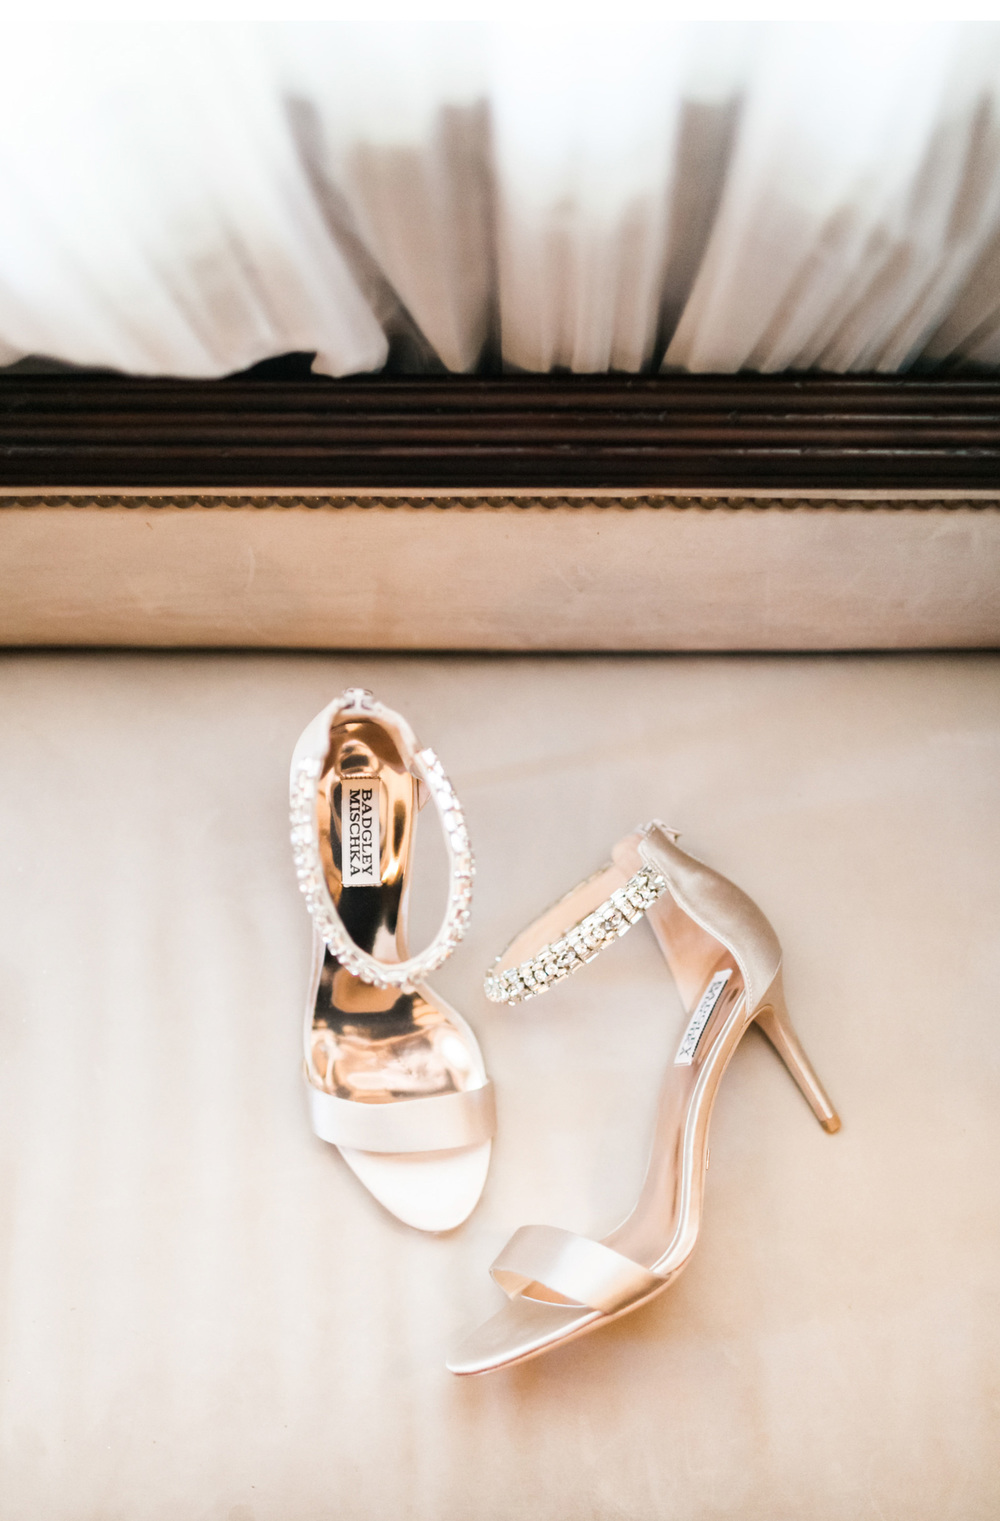 San-Juan-Capistrano-Wedding-The-Villa-Natalie-Schutt-Photography_25.jpg